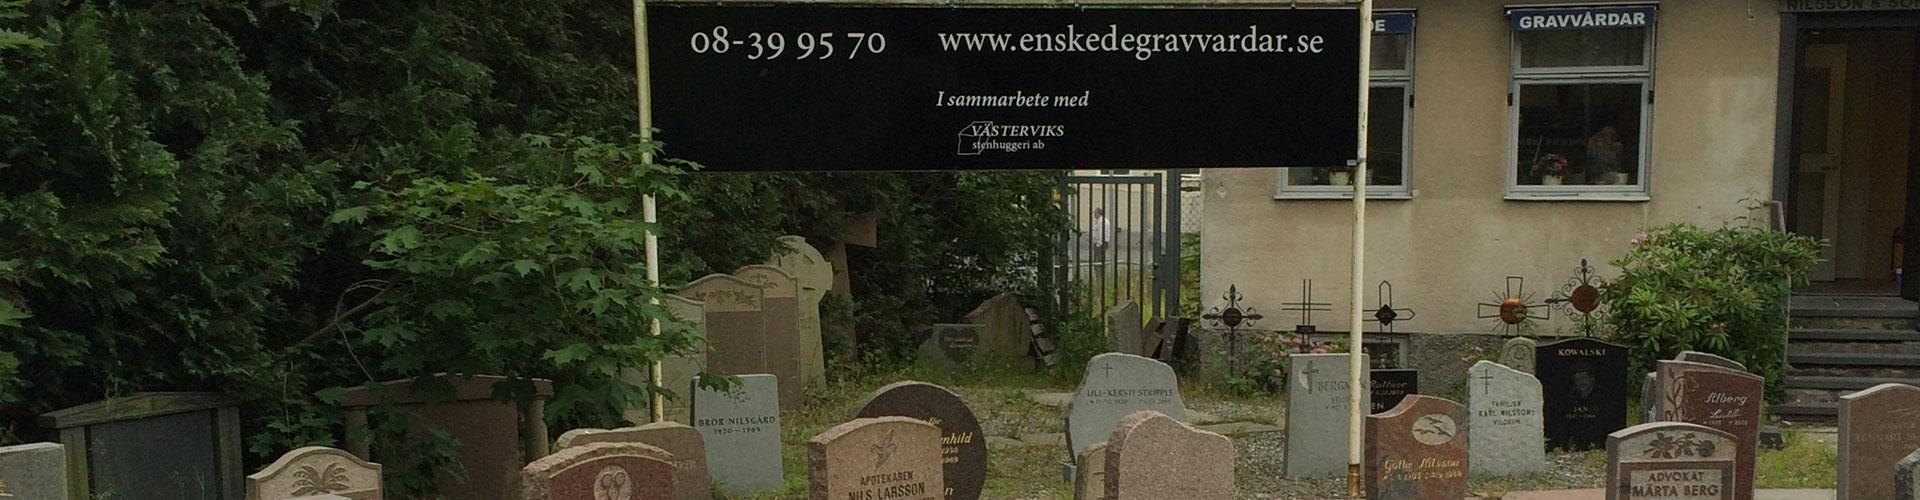 gravstenar stockholm enskede